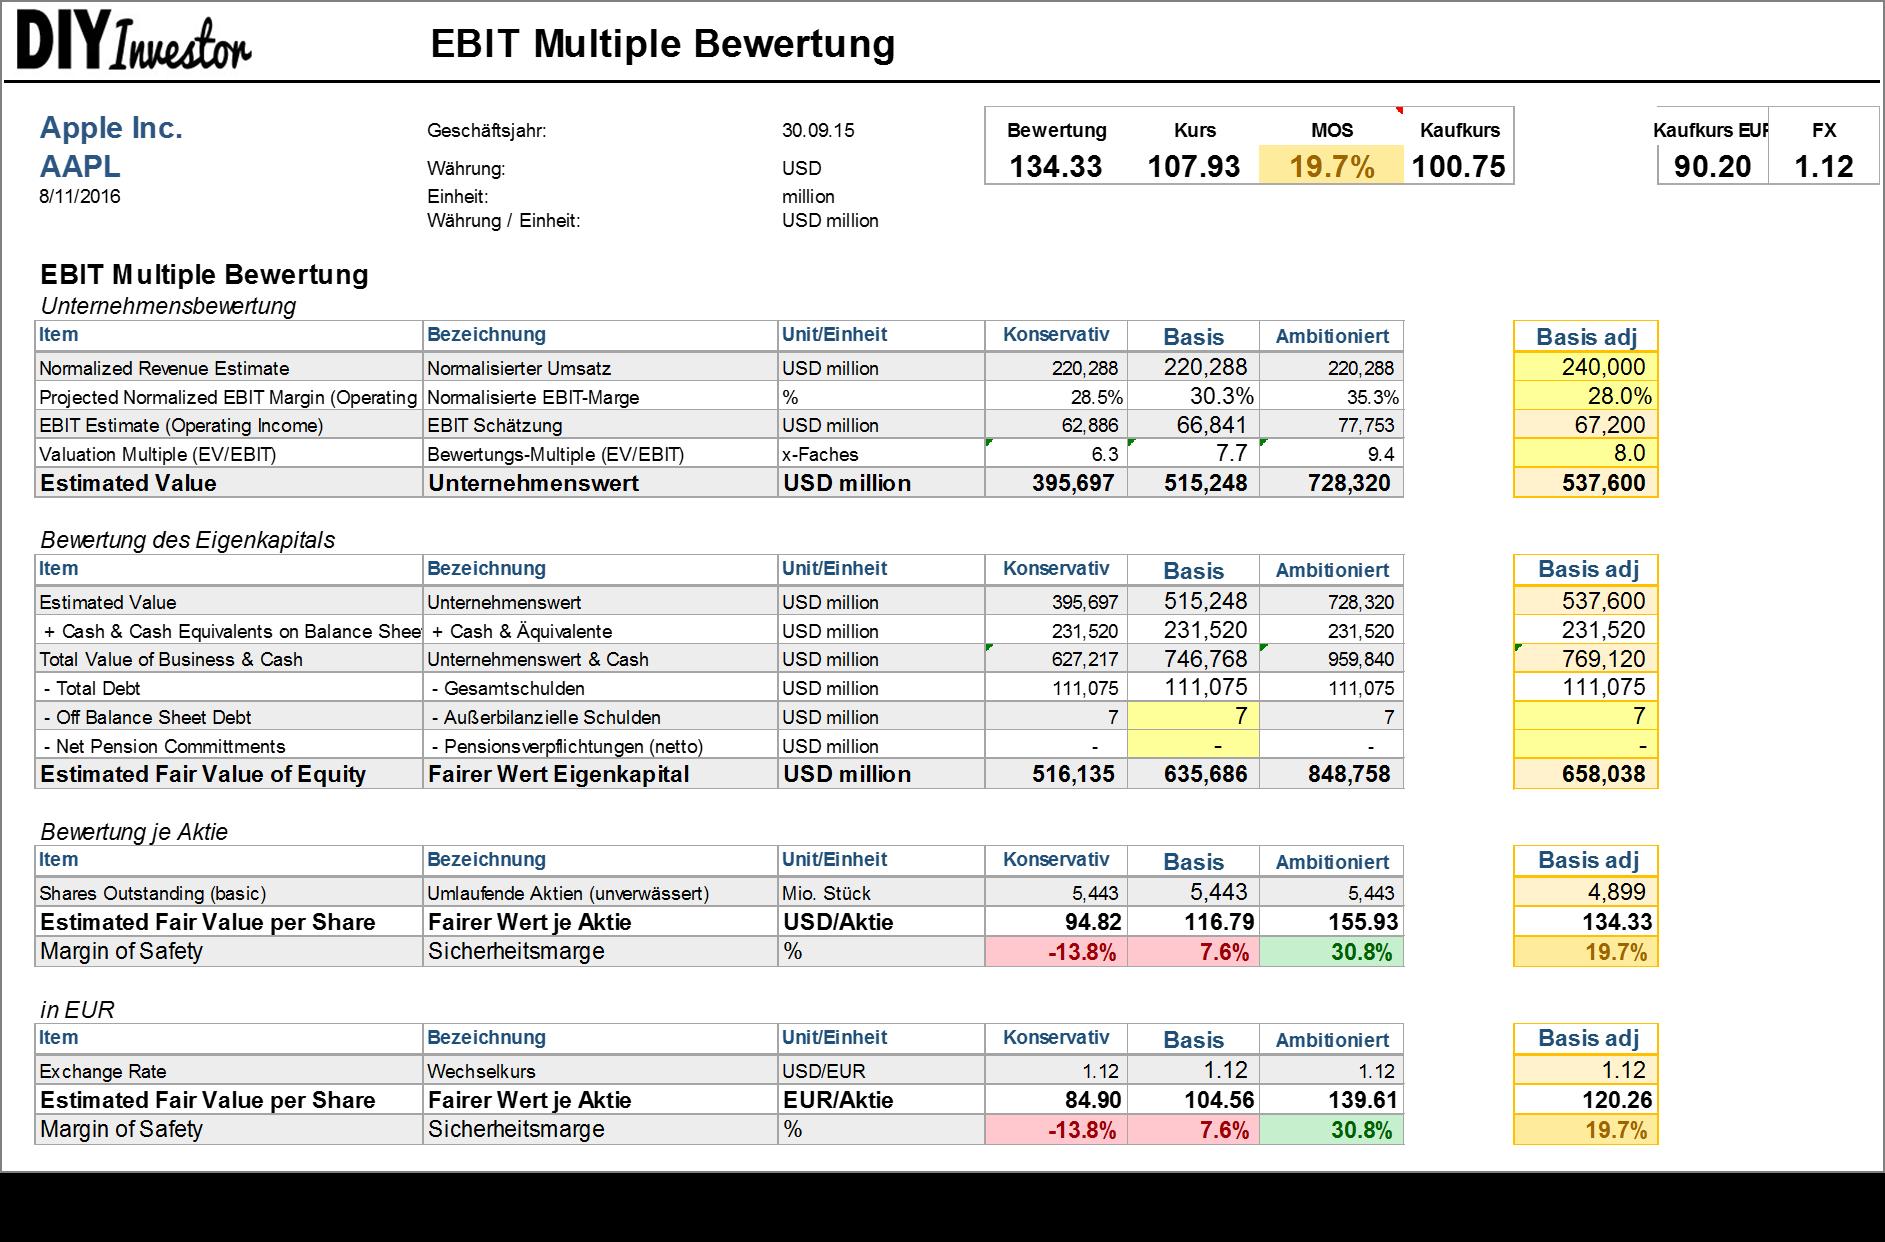 Apple EBIT Multiple Bewertung